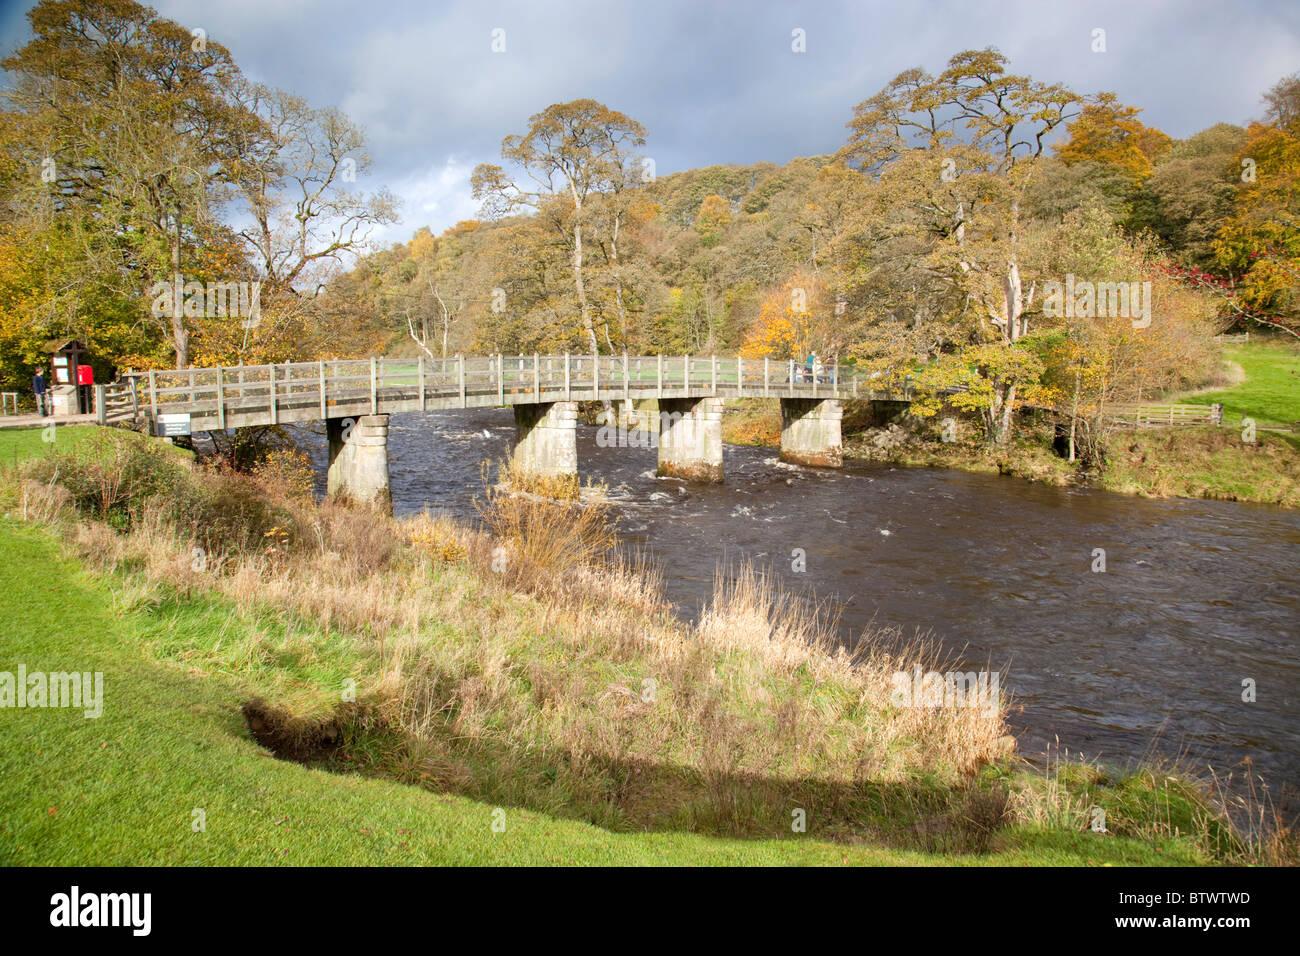 Bolton Abbey Estate; bridge over the River Wharfe; Yorkshire - Stock Image